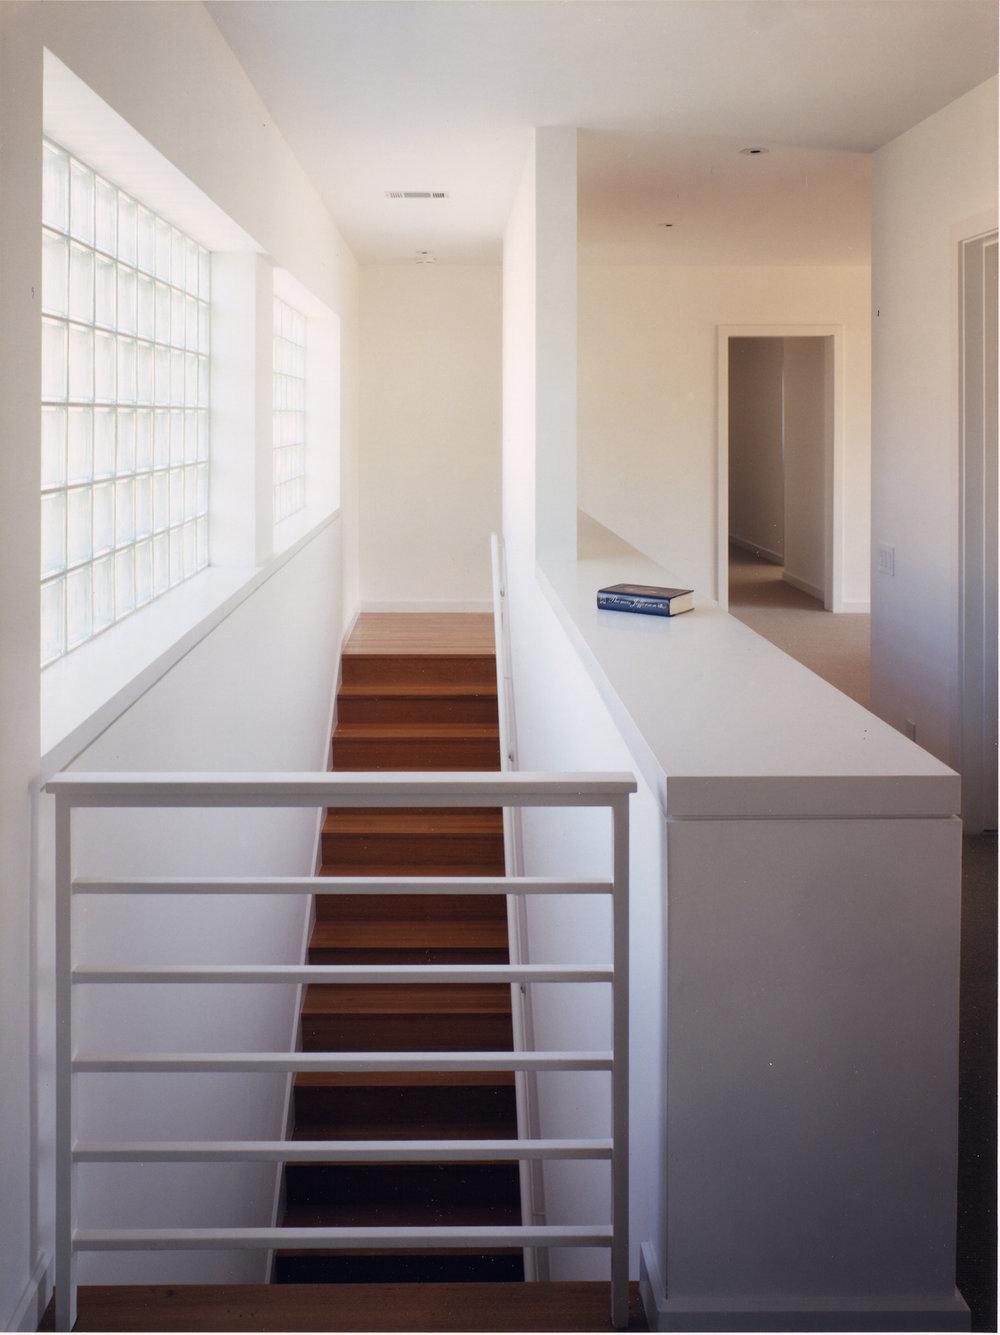 004 Wortham stair.jpg